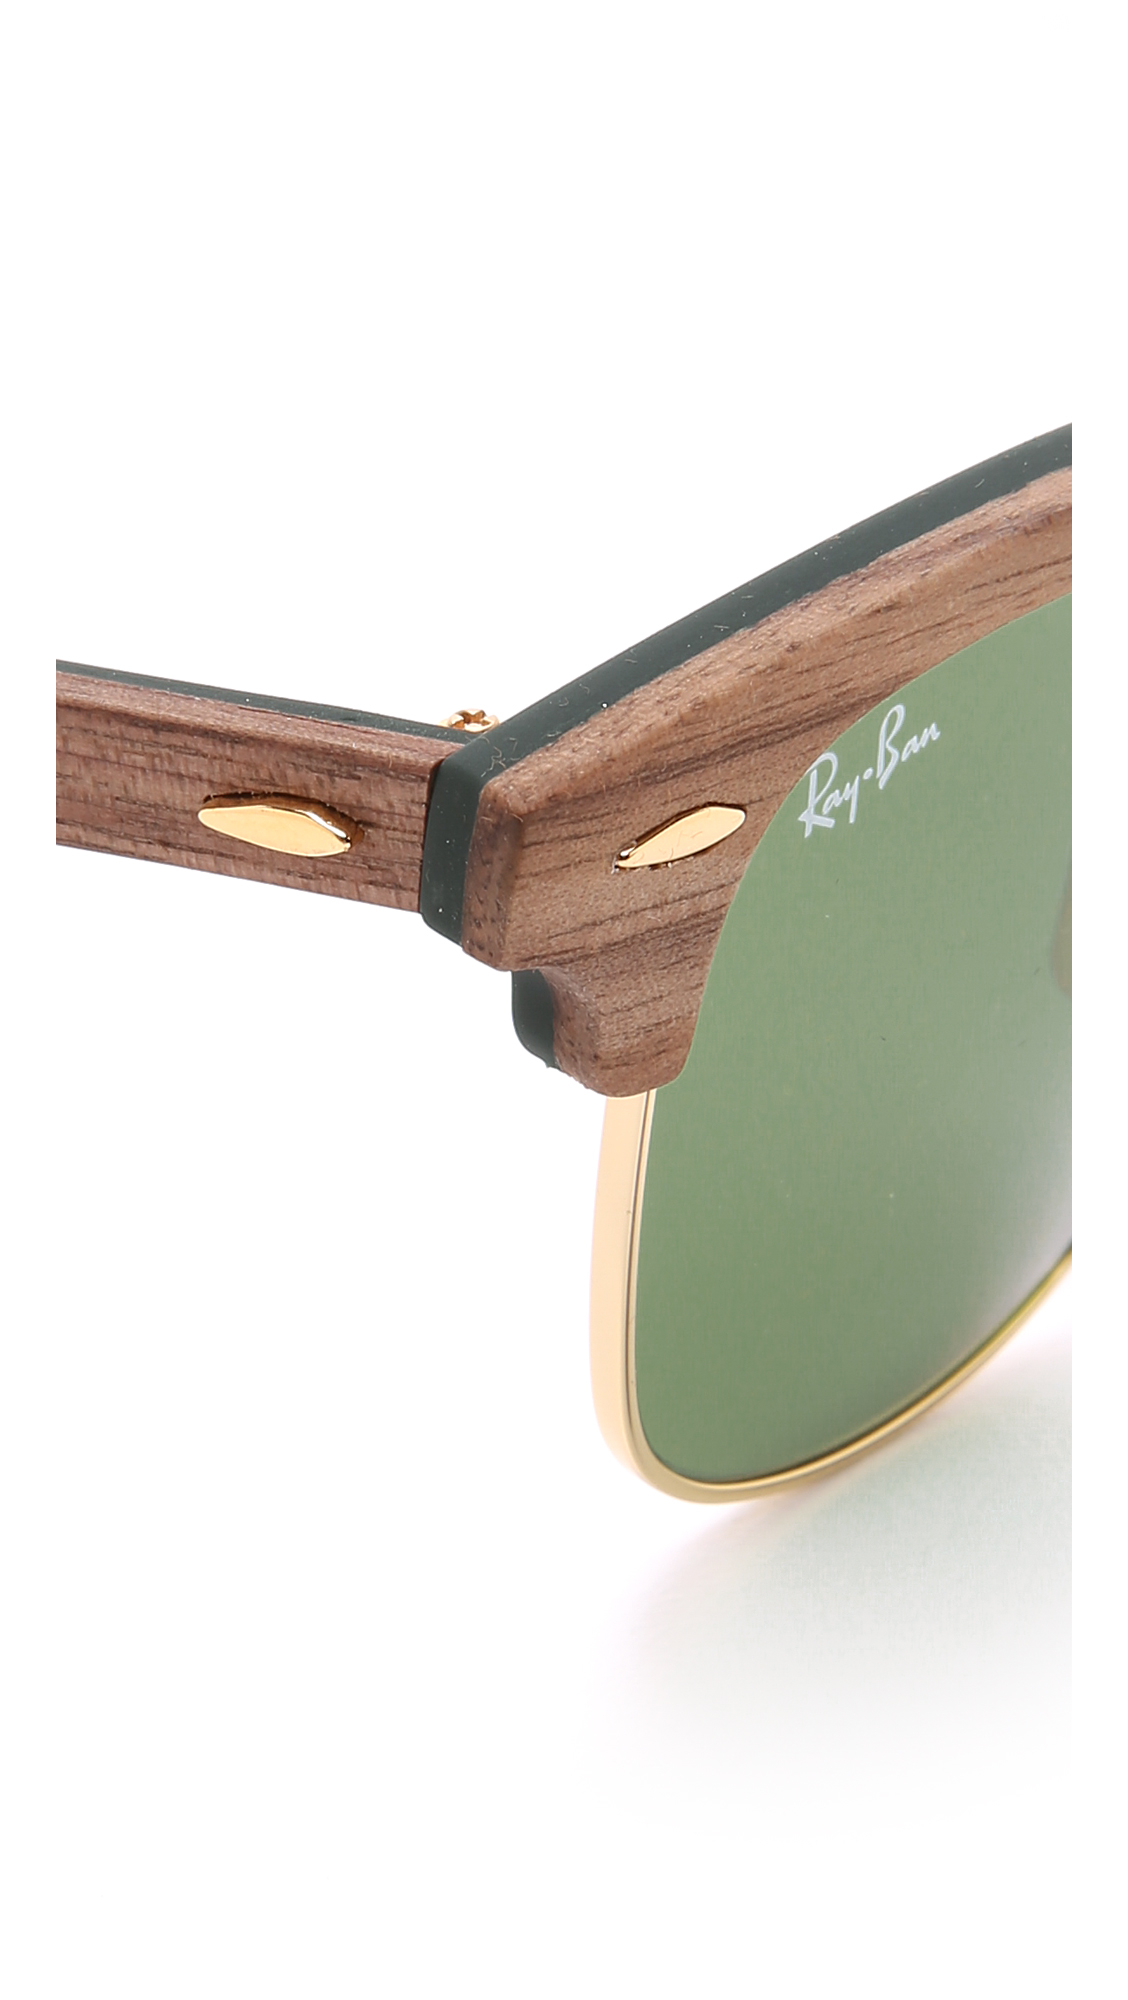 bb791ed6c8b3 Ray Ban Clubmaster Wood Frame